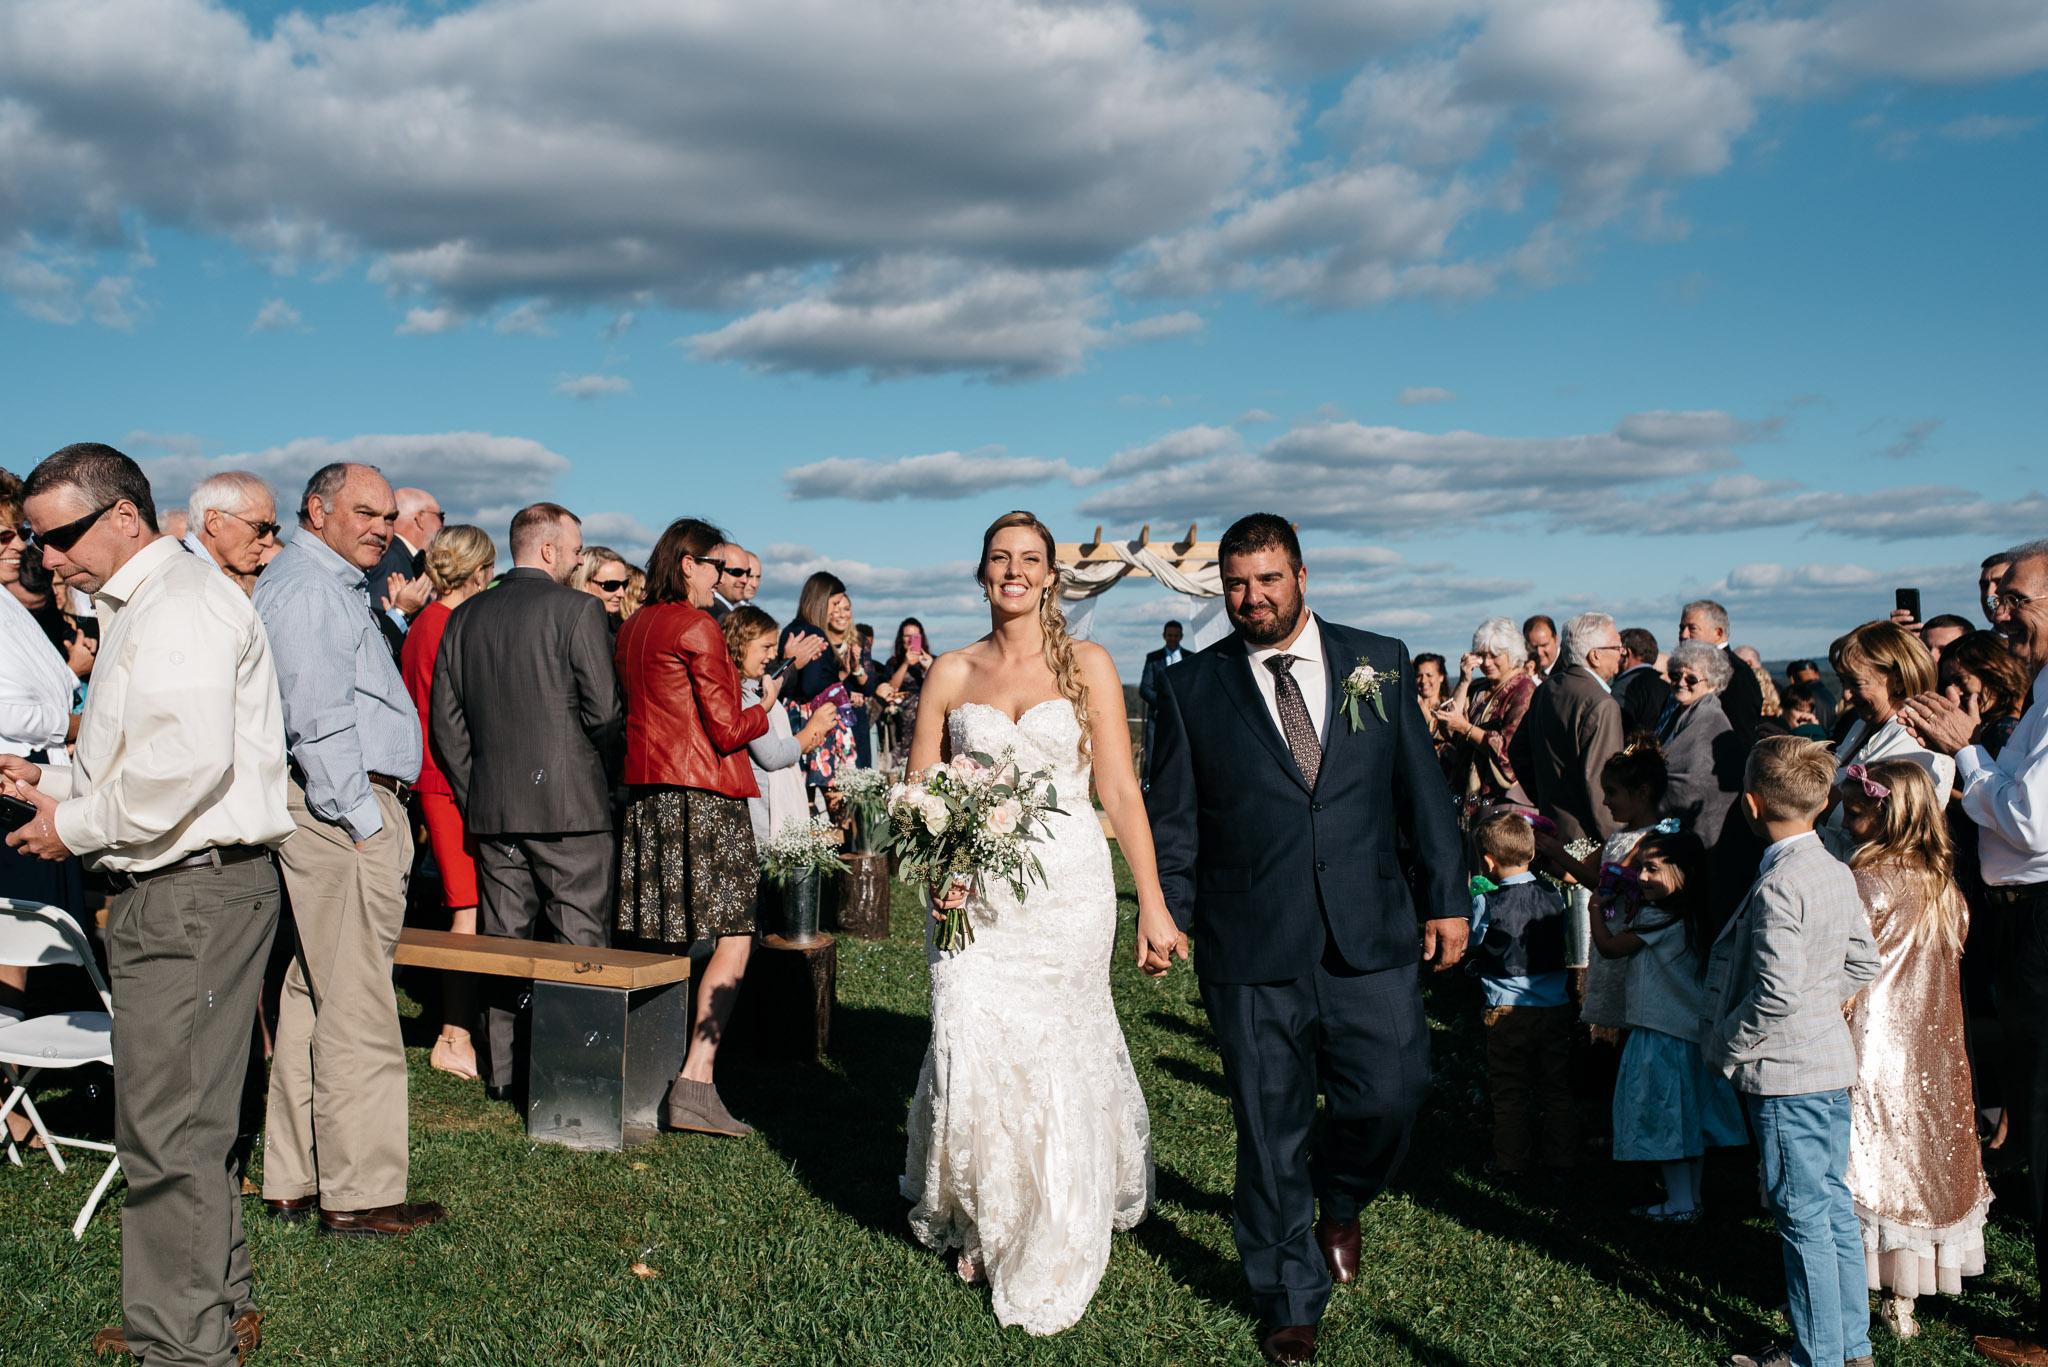 pittsburgh-ligonier-wedding-photographer-the-event-barn-at-highland-farms-19.jpg